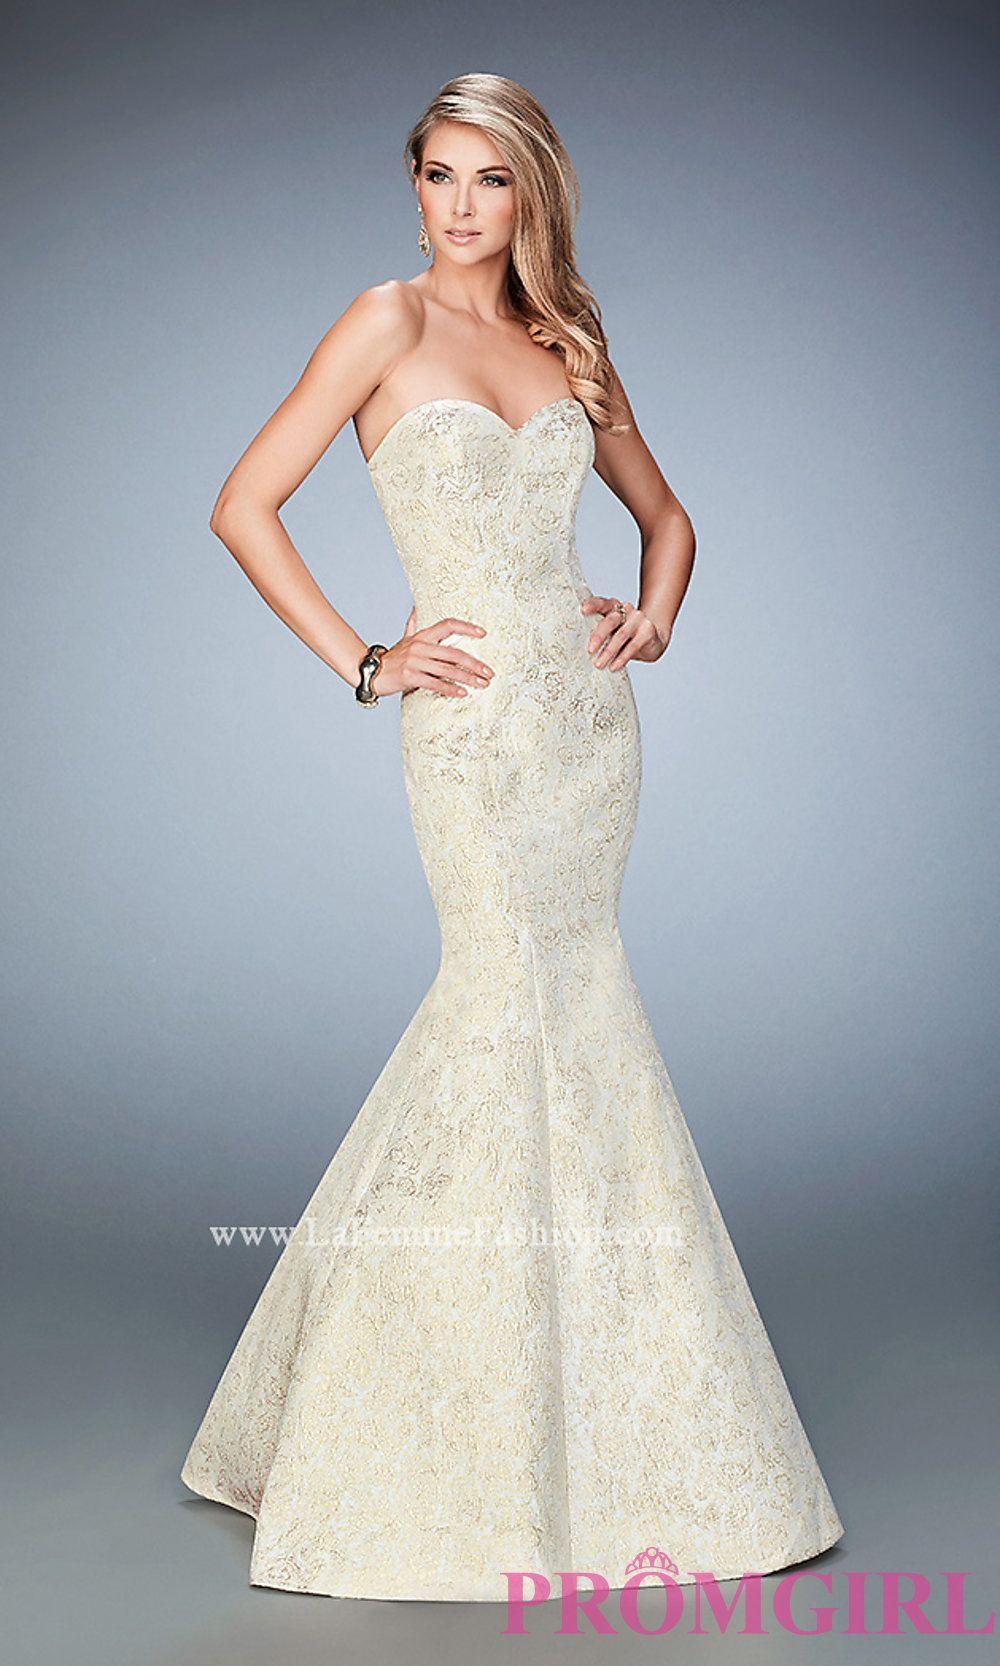 08094292206 Strapless Mermaid Style Long Prom Dress by La Femme Style  LF-22570 ...